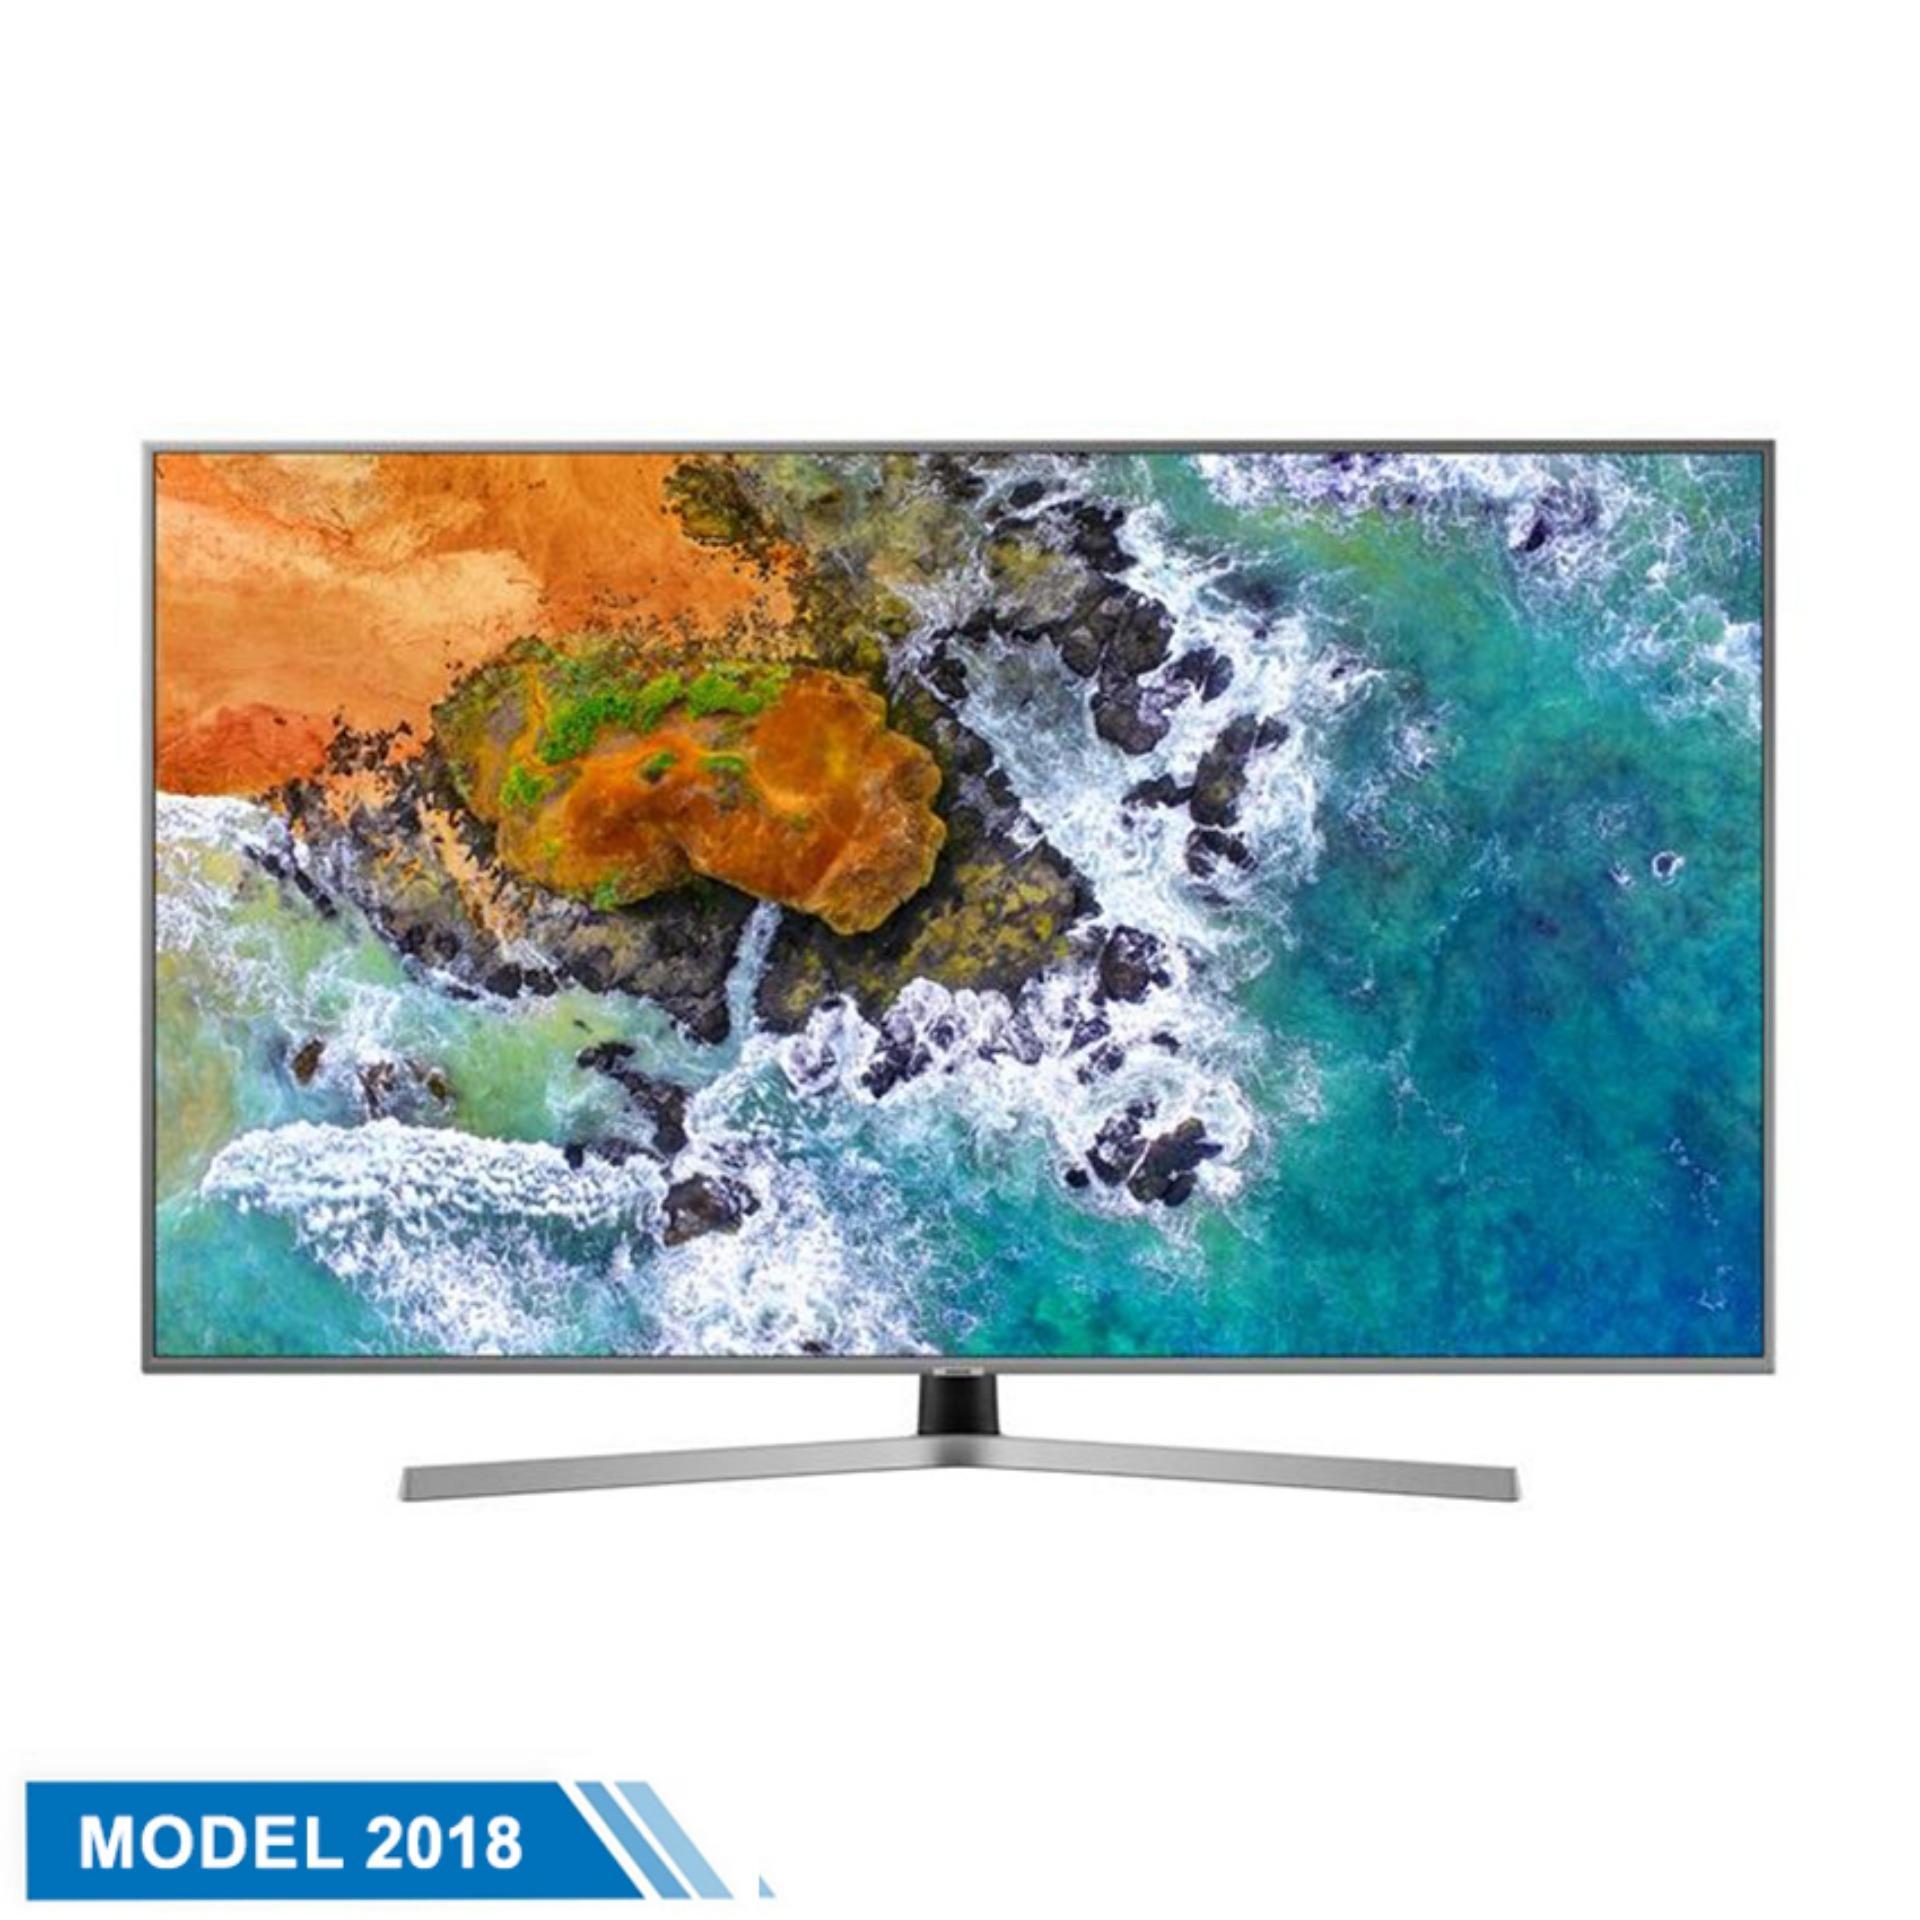 Smart TV Samsung 50inch 4K Ultra HD - Model UA50NU7400KXXV...